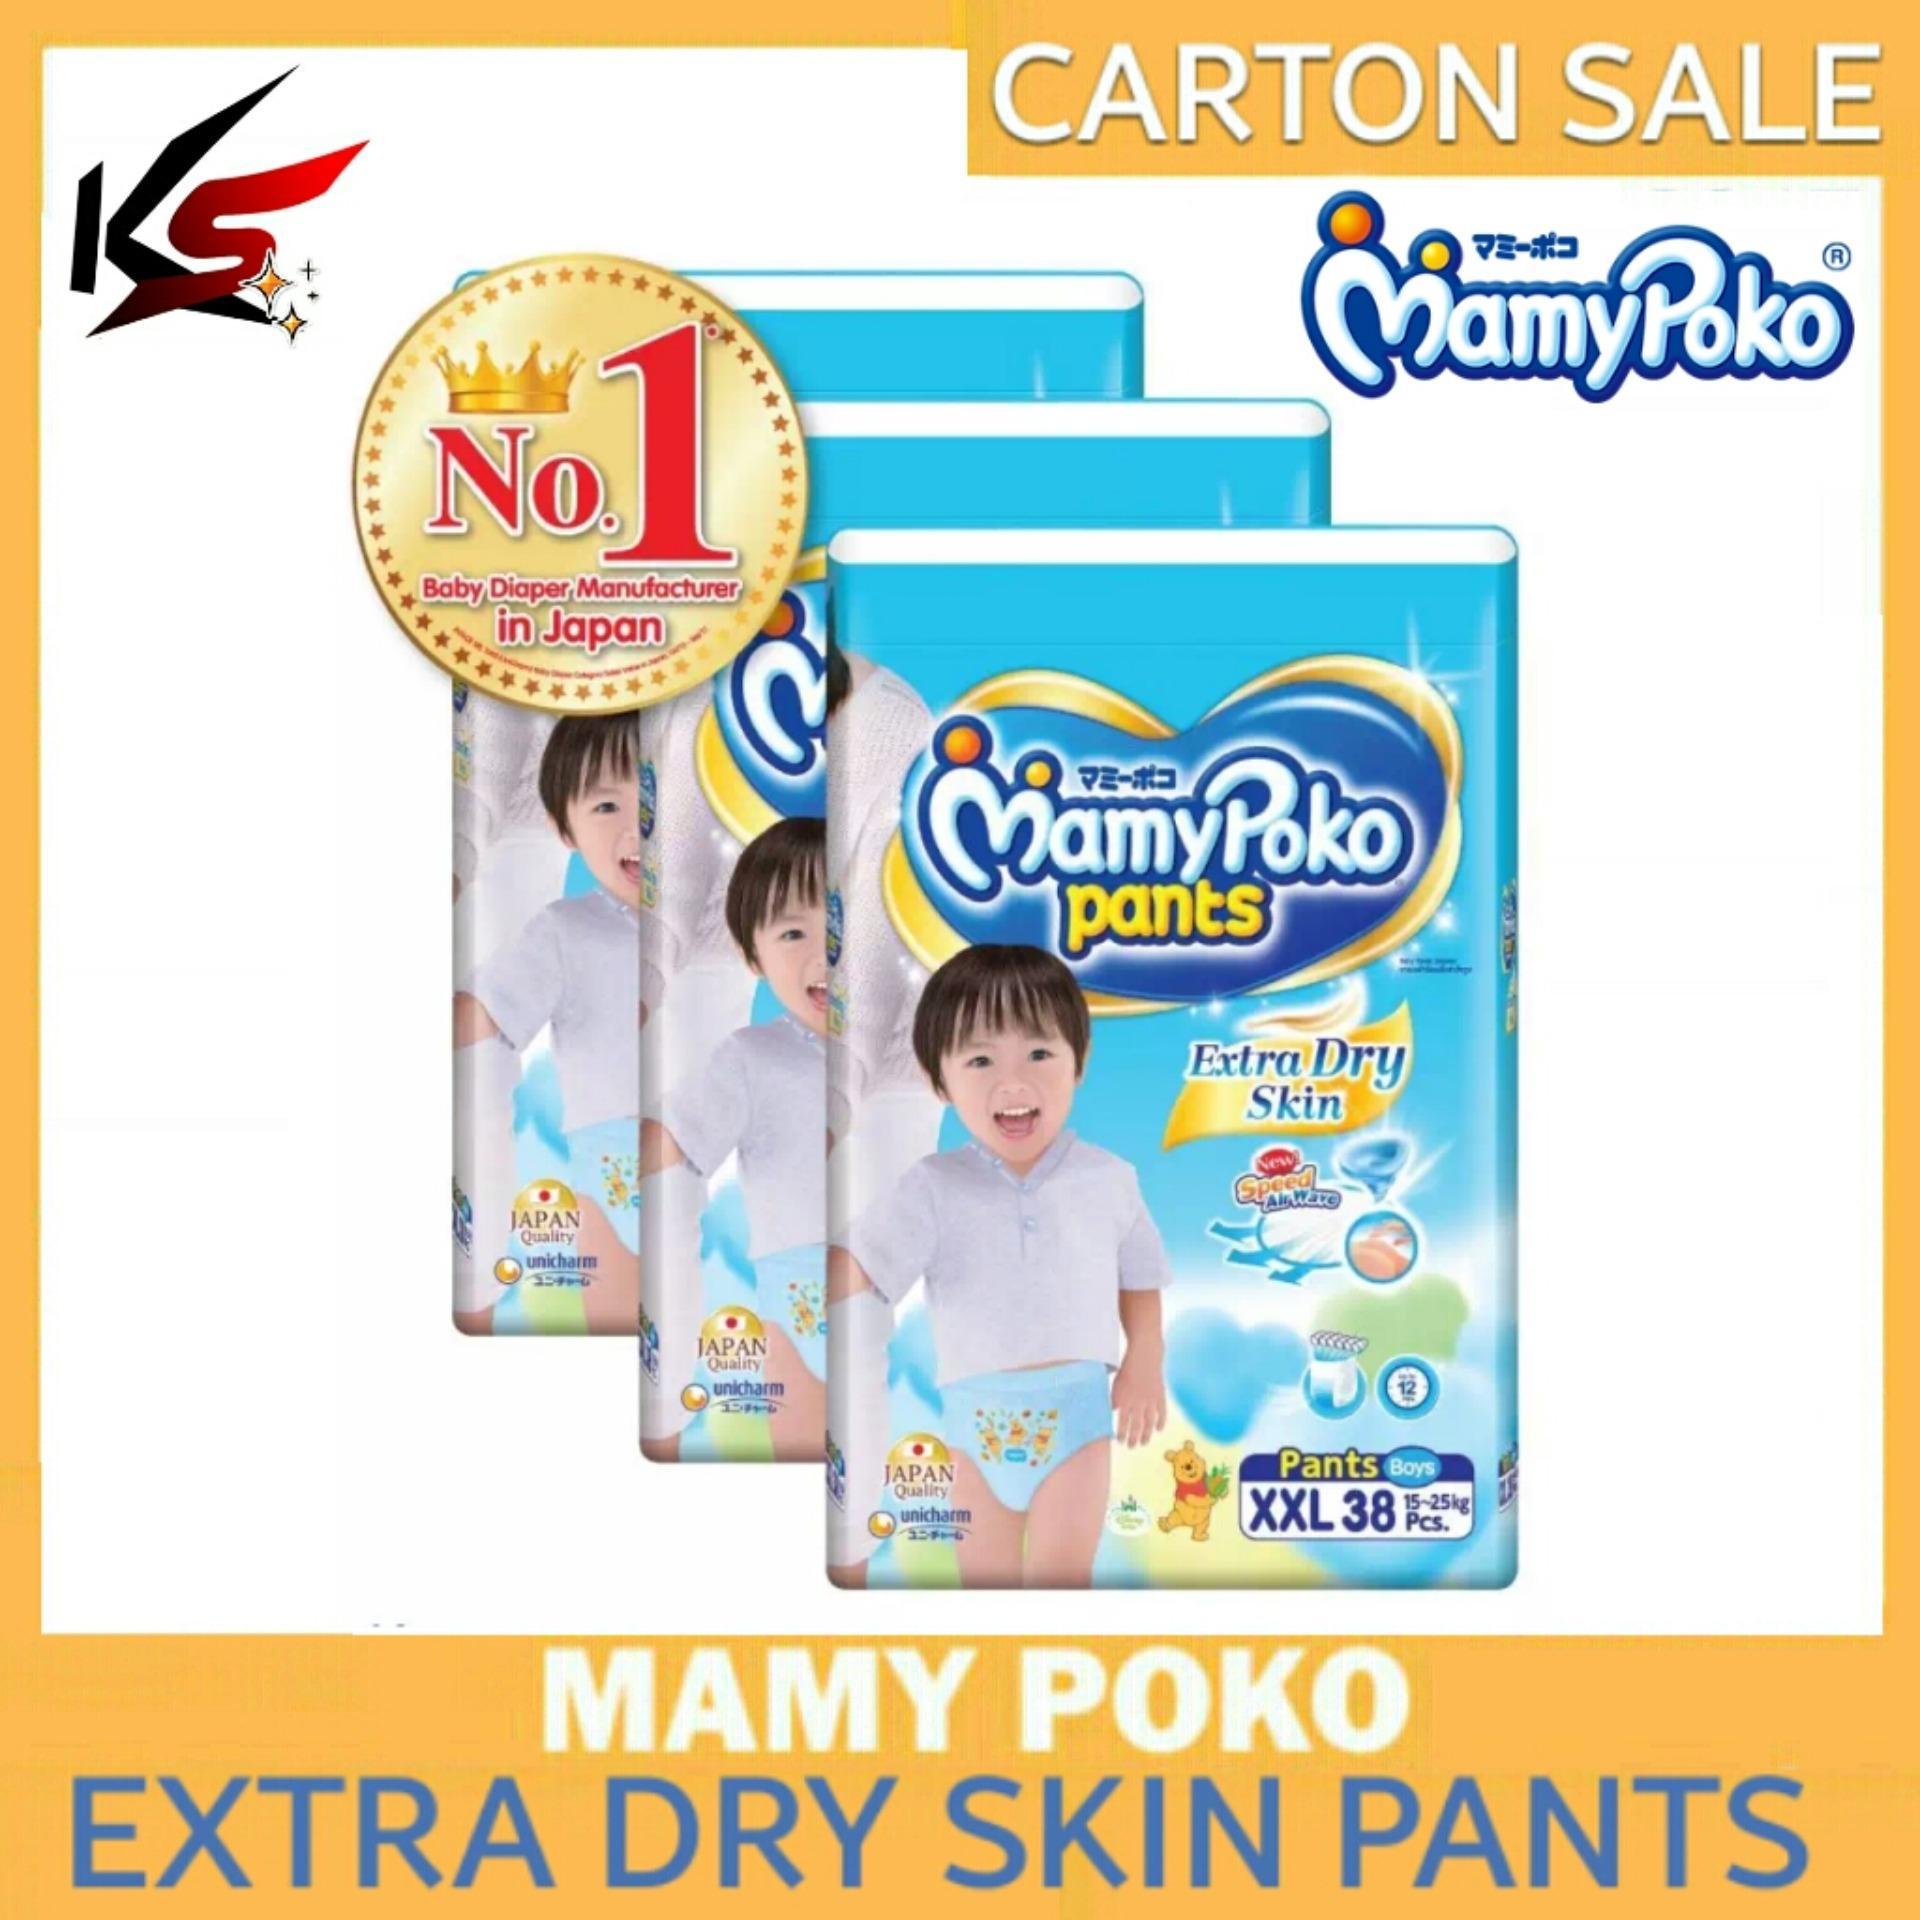 Discount Mamypoko Mamy Poko Tsum Tsum Extra Dry Skin Pants Boy Xxl 38 4 X 3 Packs Mamypoko On Singapore